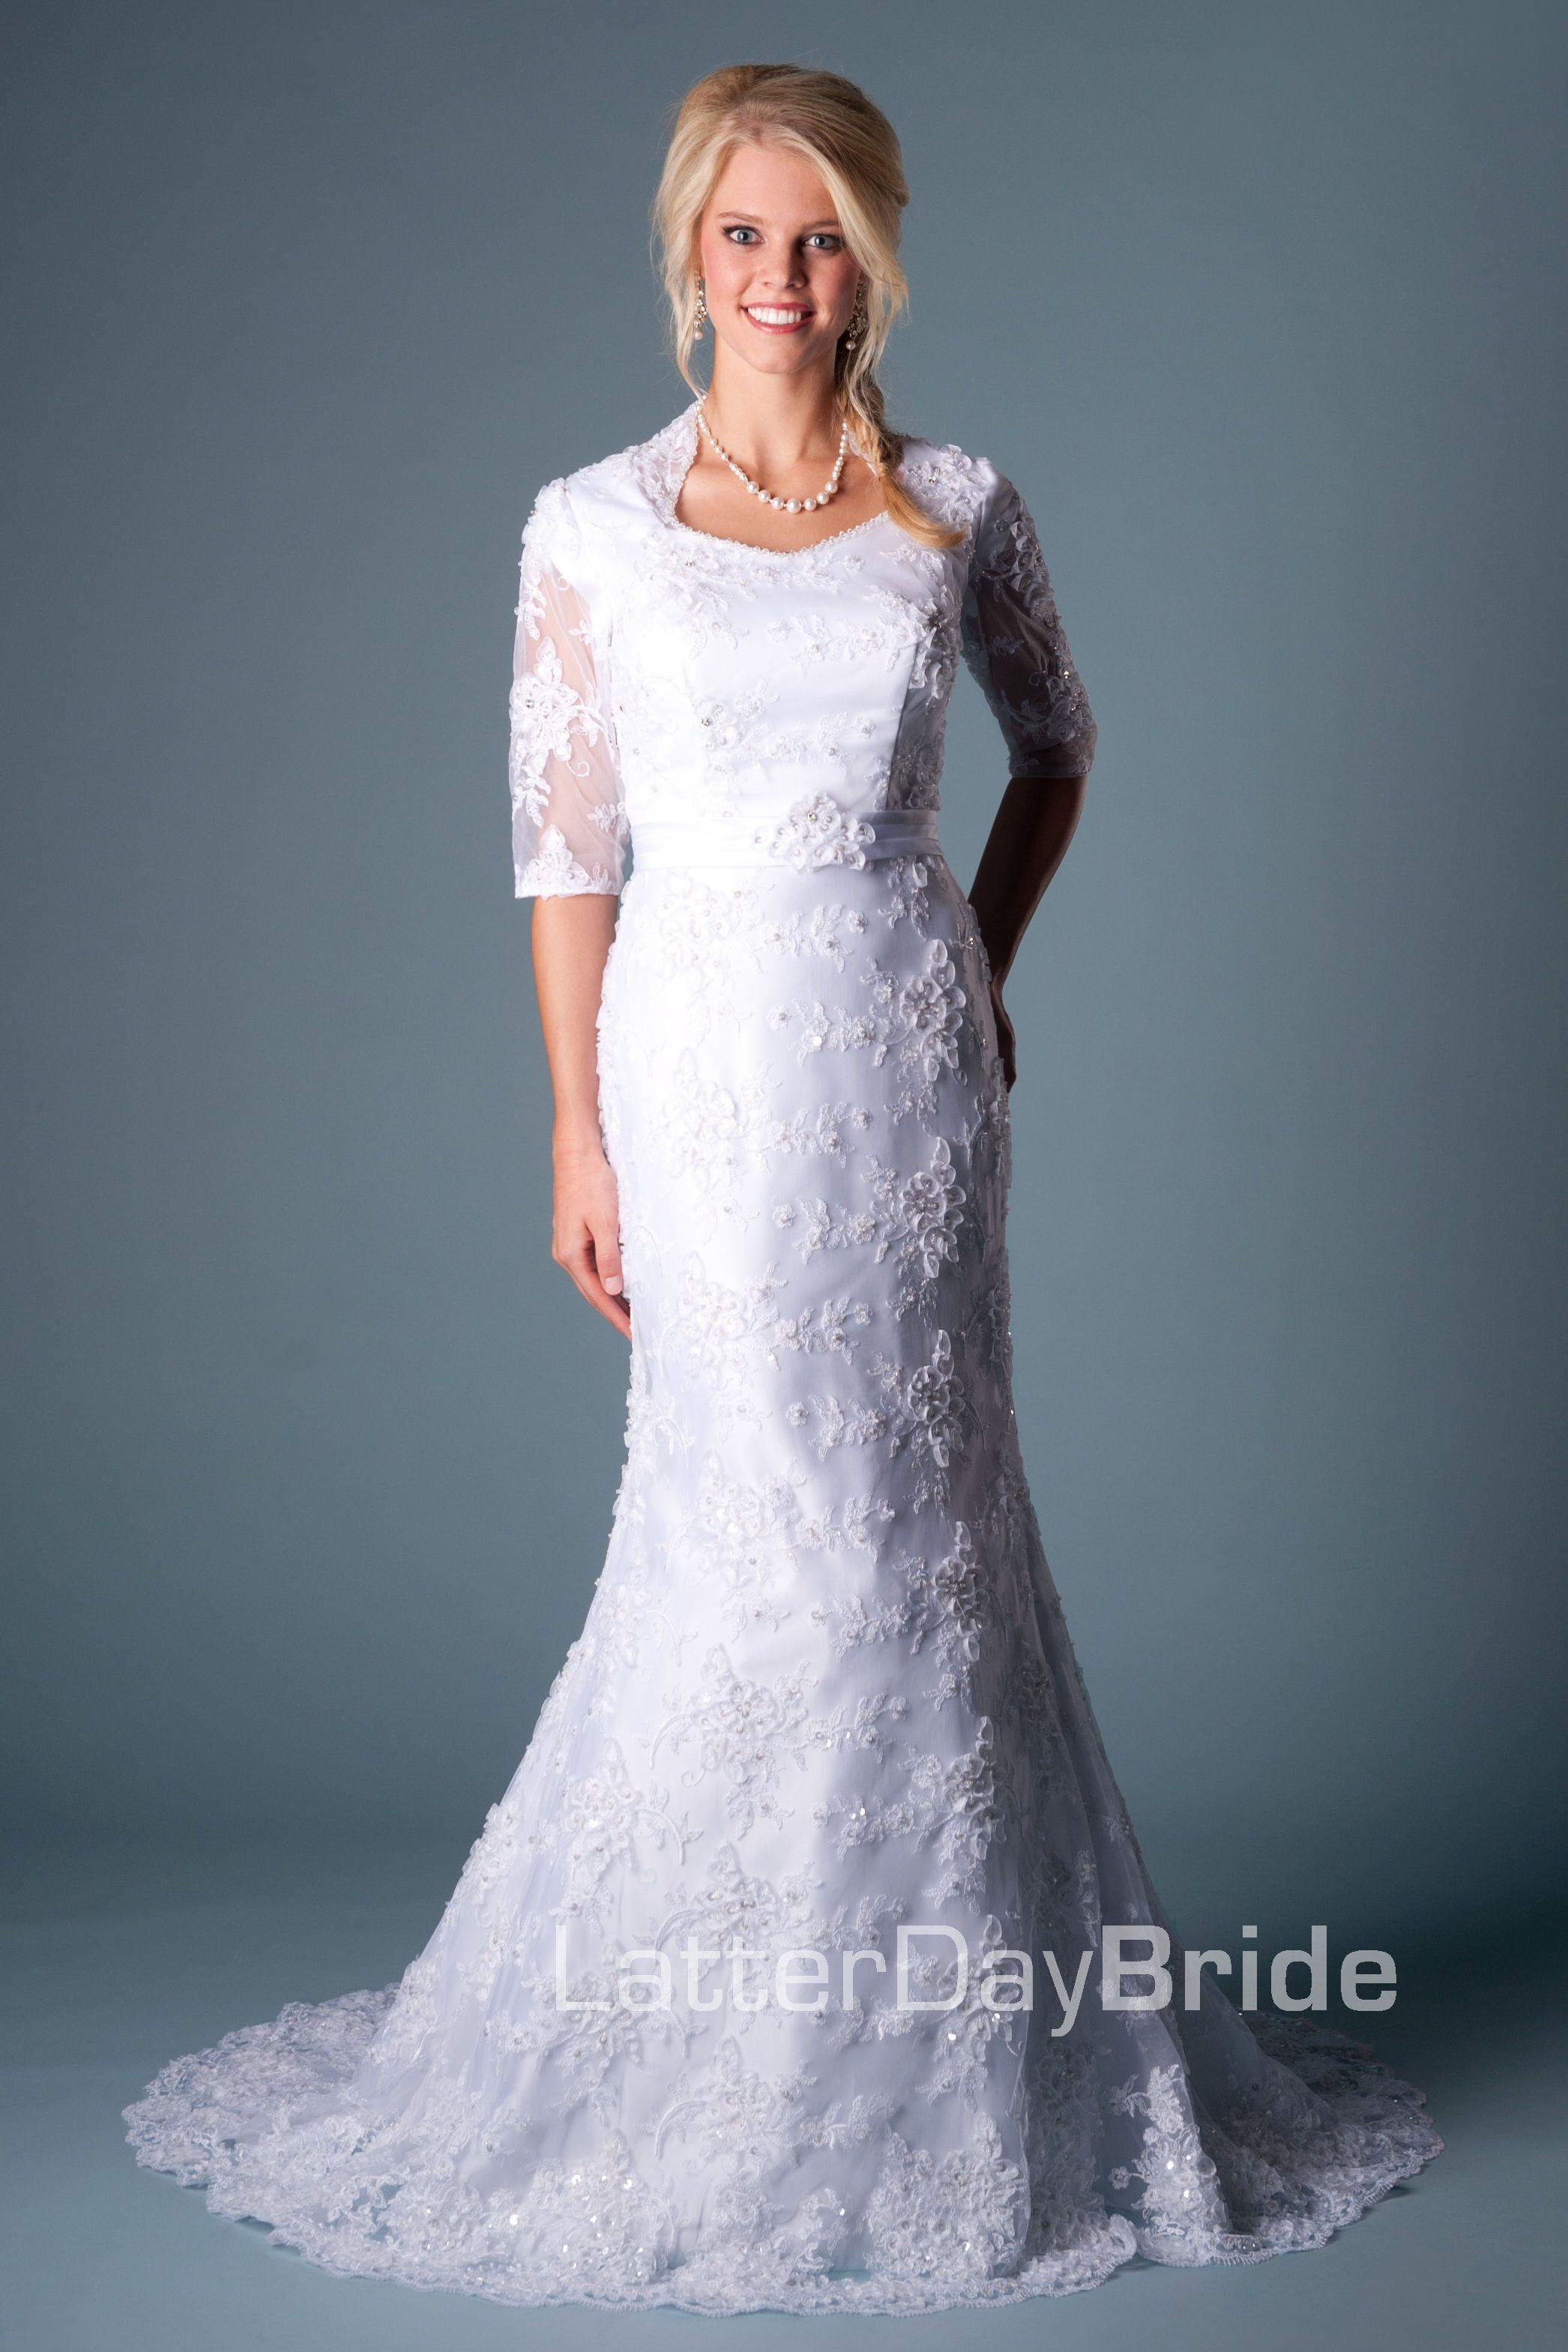 Gateway Bridal/Asbury   September 2nd!   Pinterest   Vestidos de ...